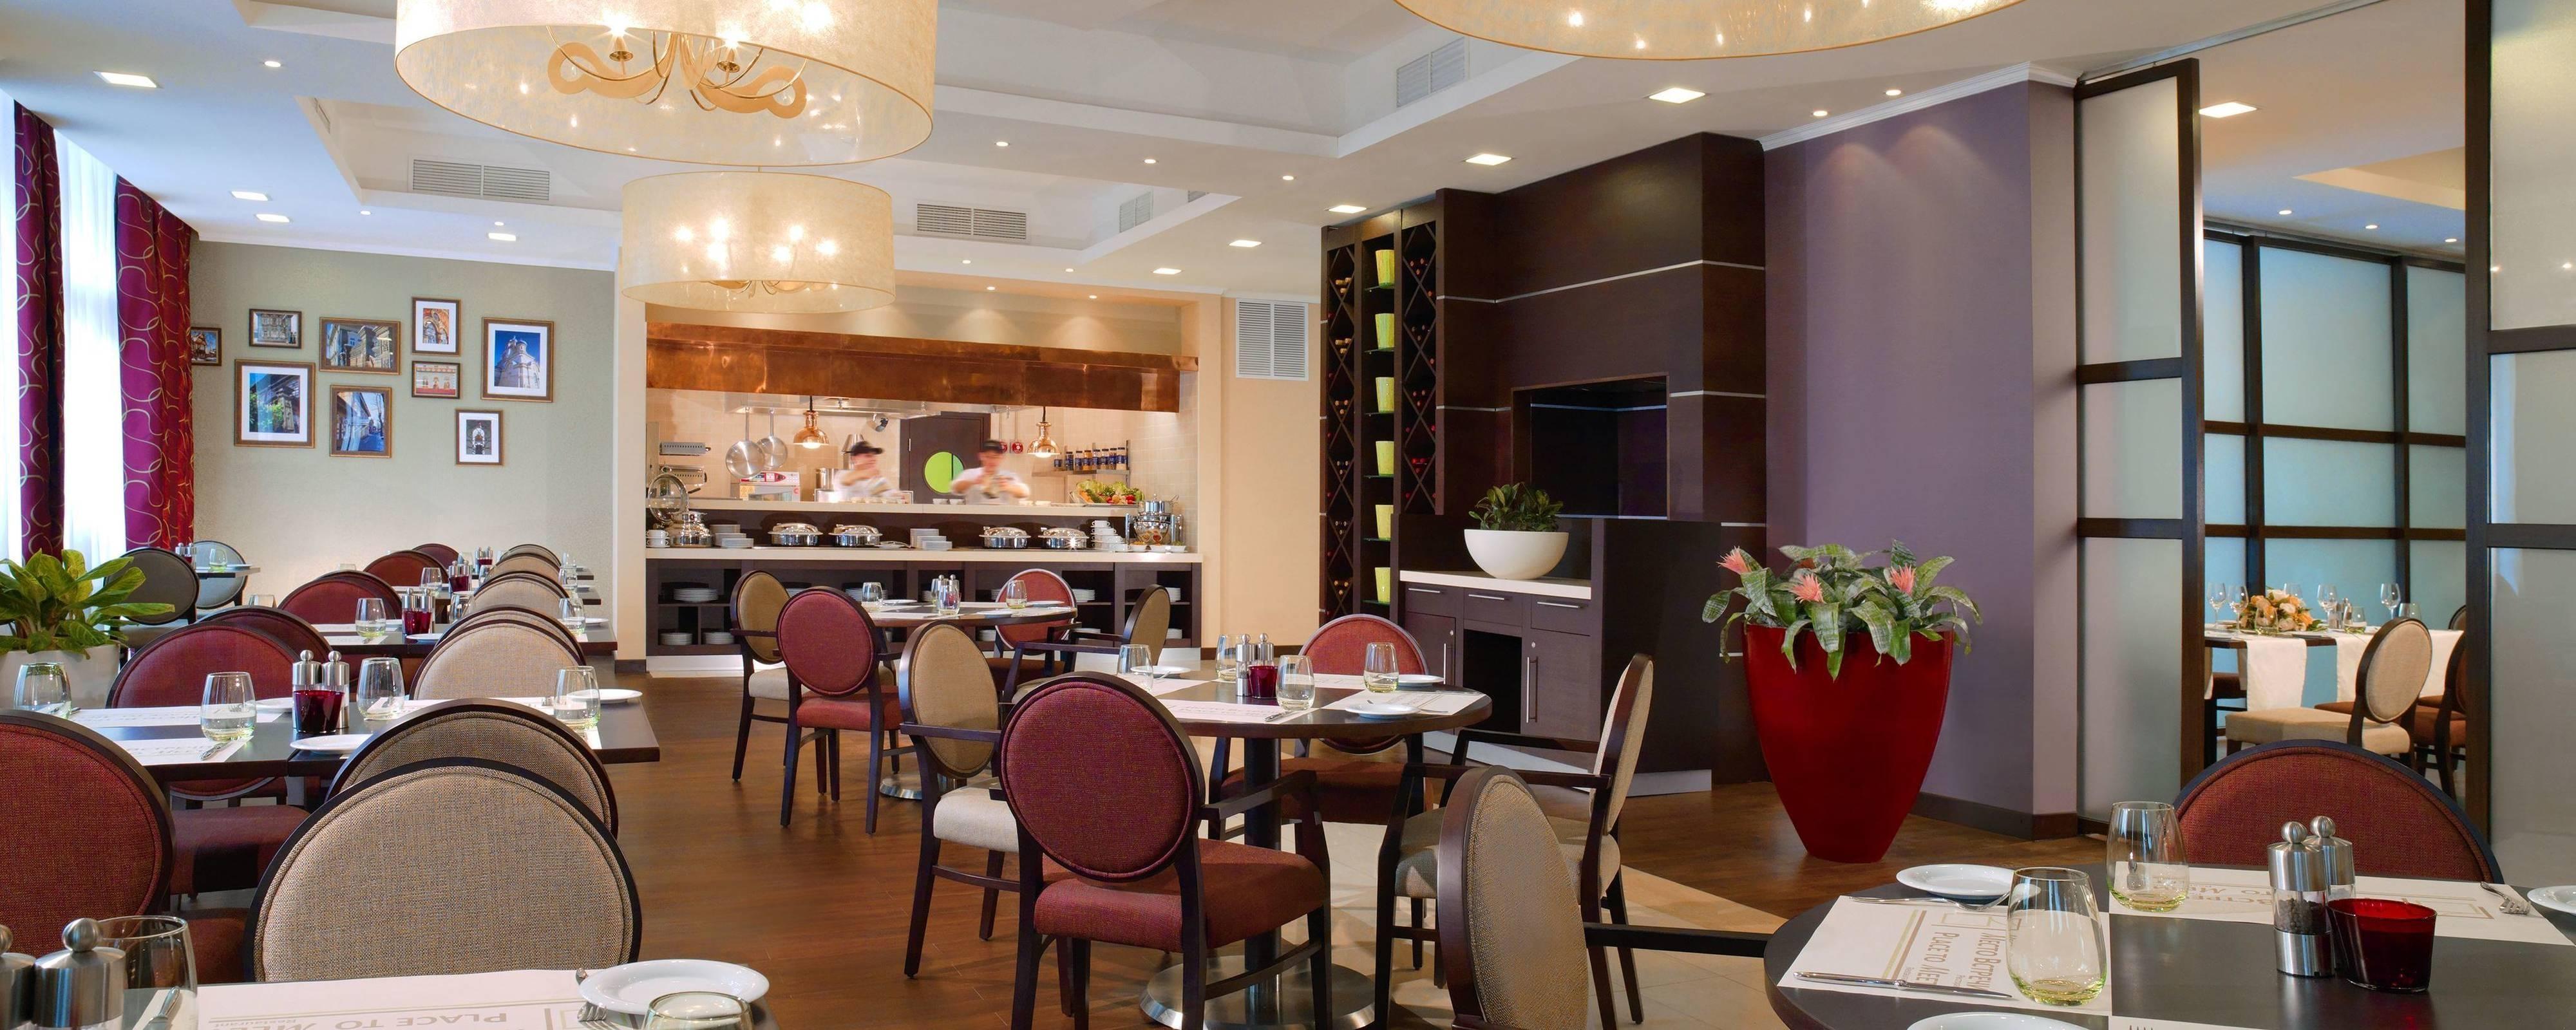 Ресторан Mesto Vstrechi в отеле Courtyard (Иркутск)